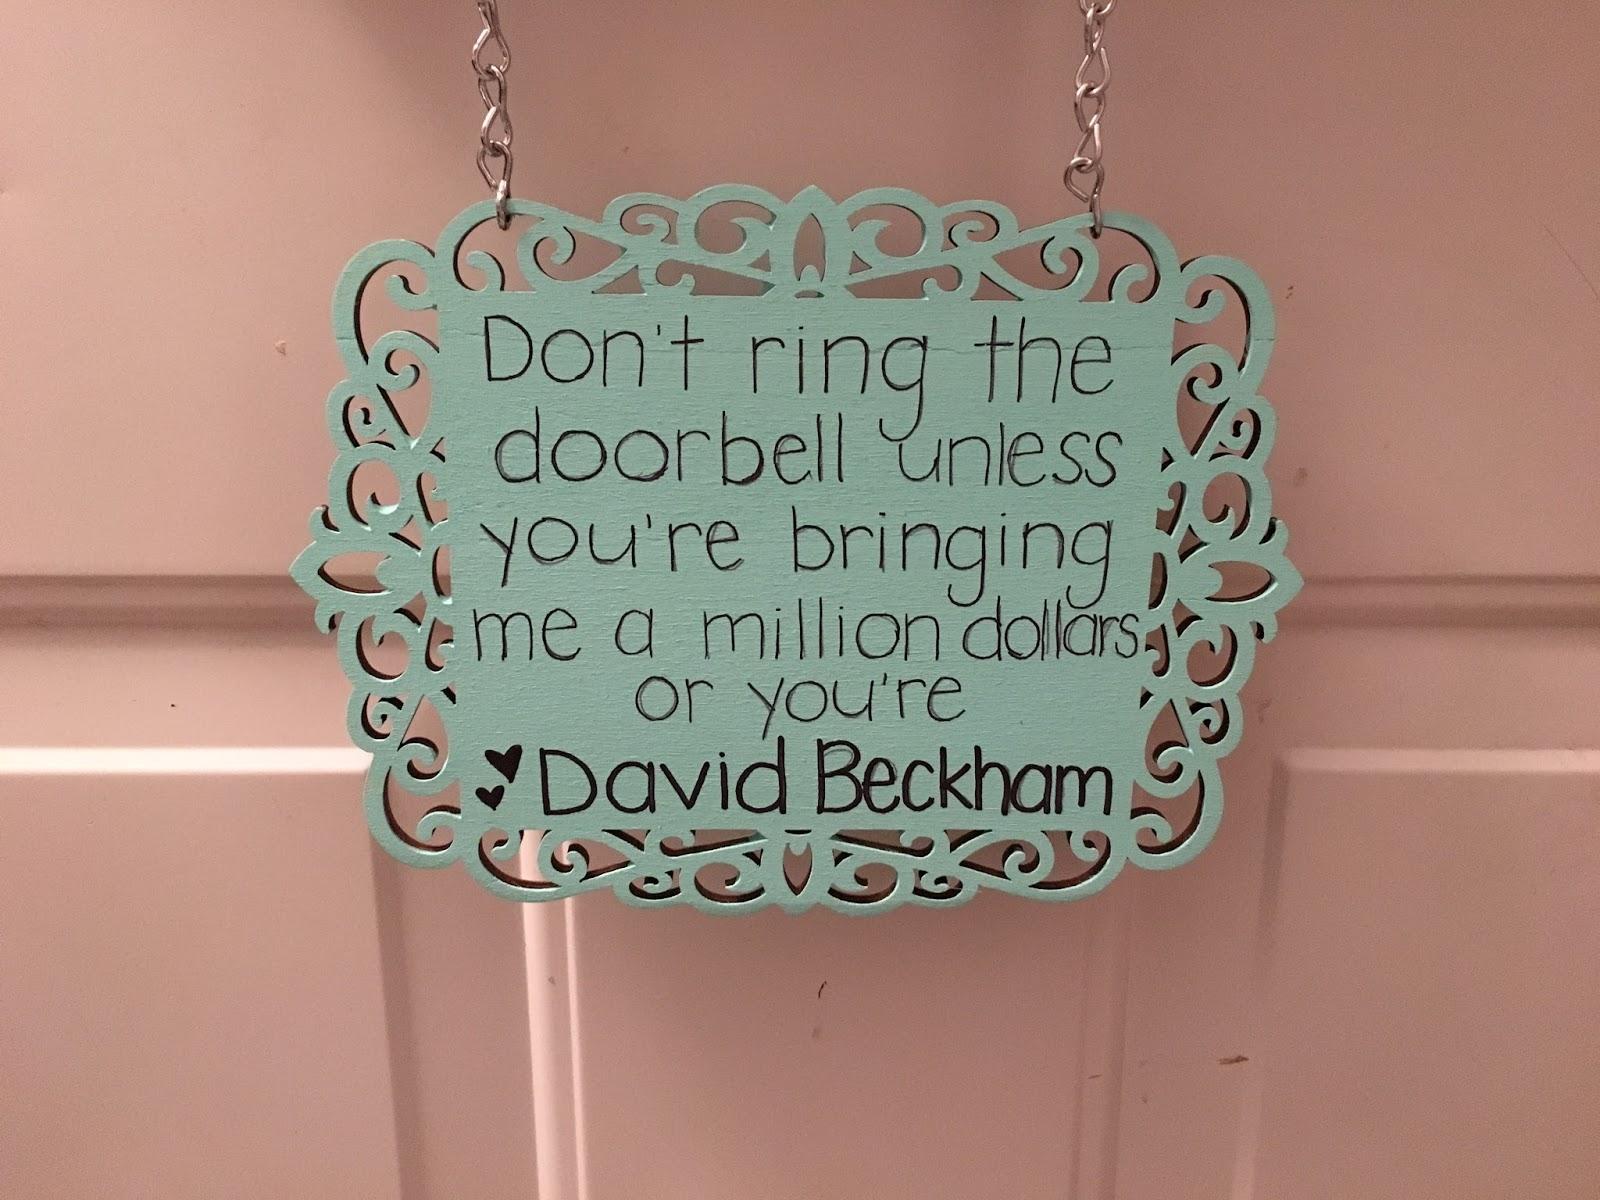 napping door sign